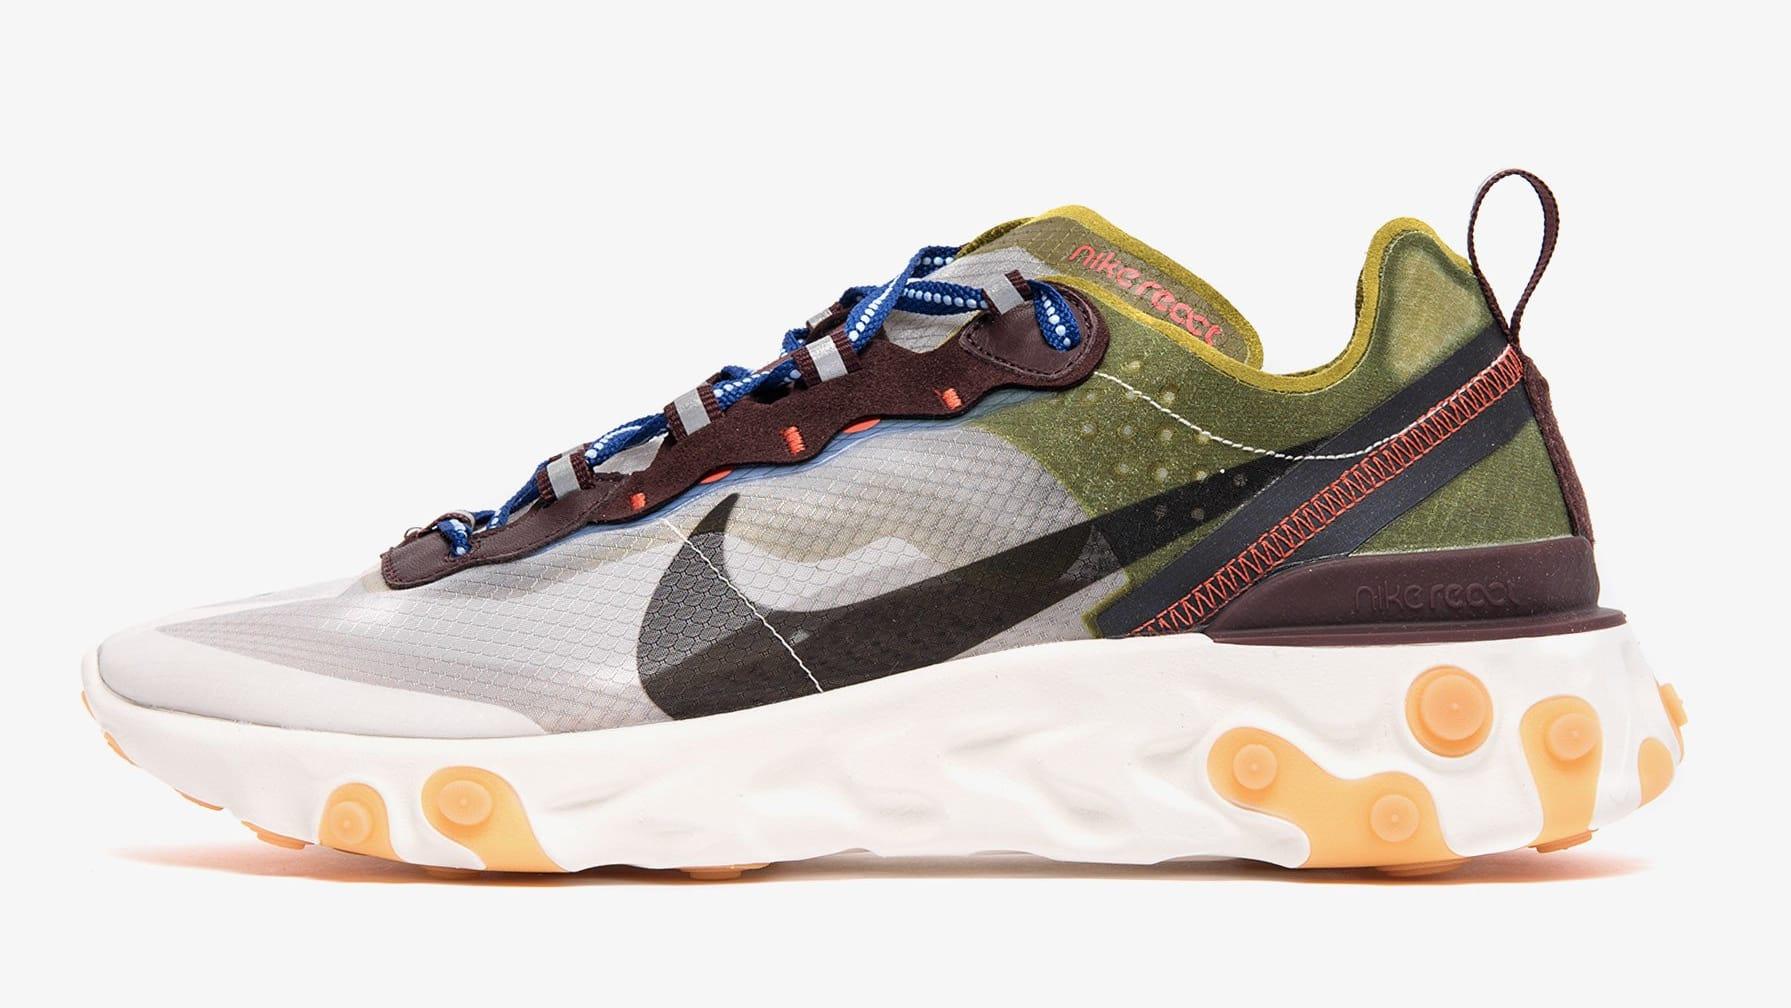 Nike React Element 87 'Moss/Black-El Dorado-Deep Royal Blue' AQ1090-300 (Lateral)